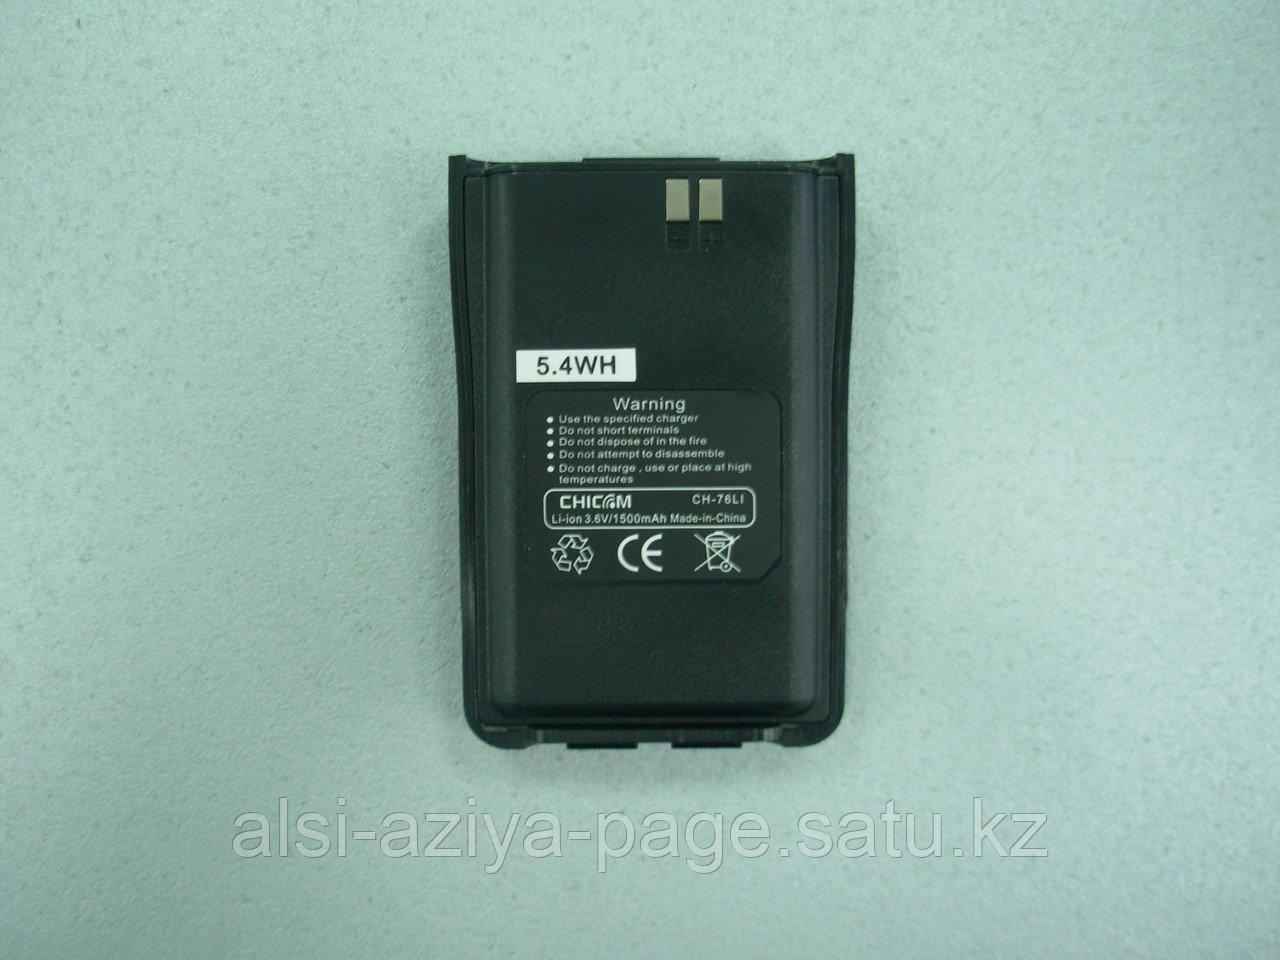 Аккумулятор Chicom для р/ст CH-350i